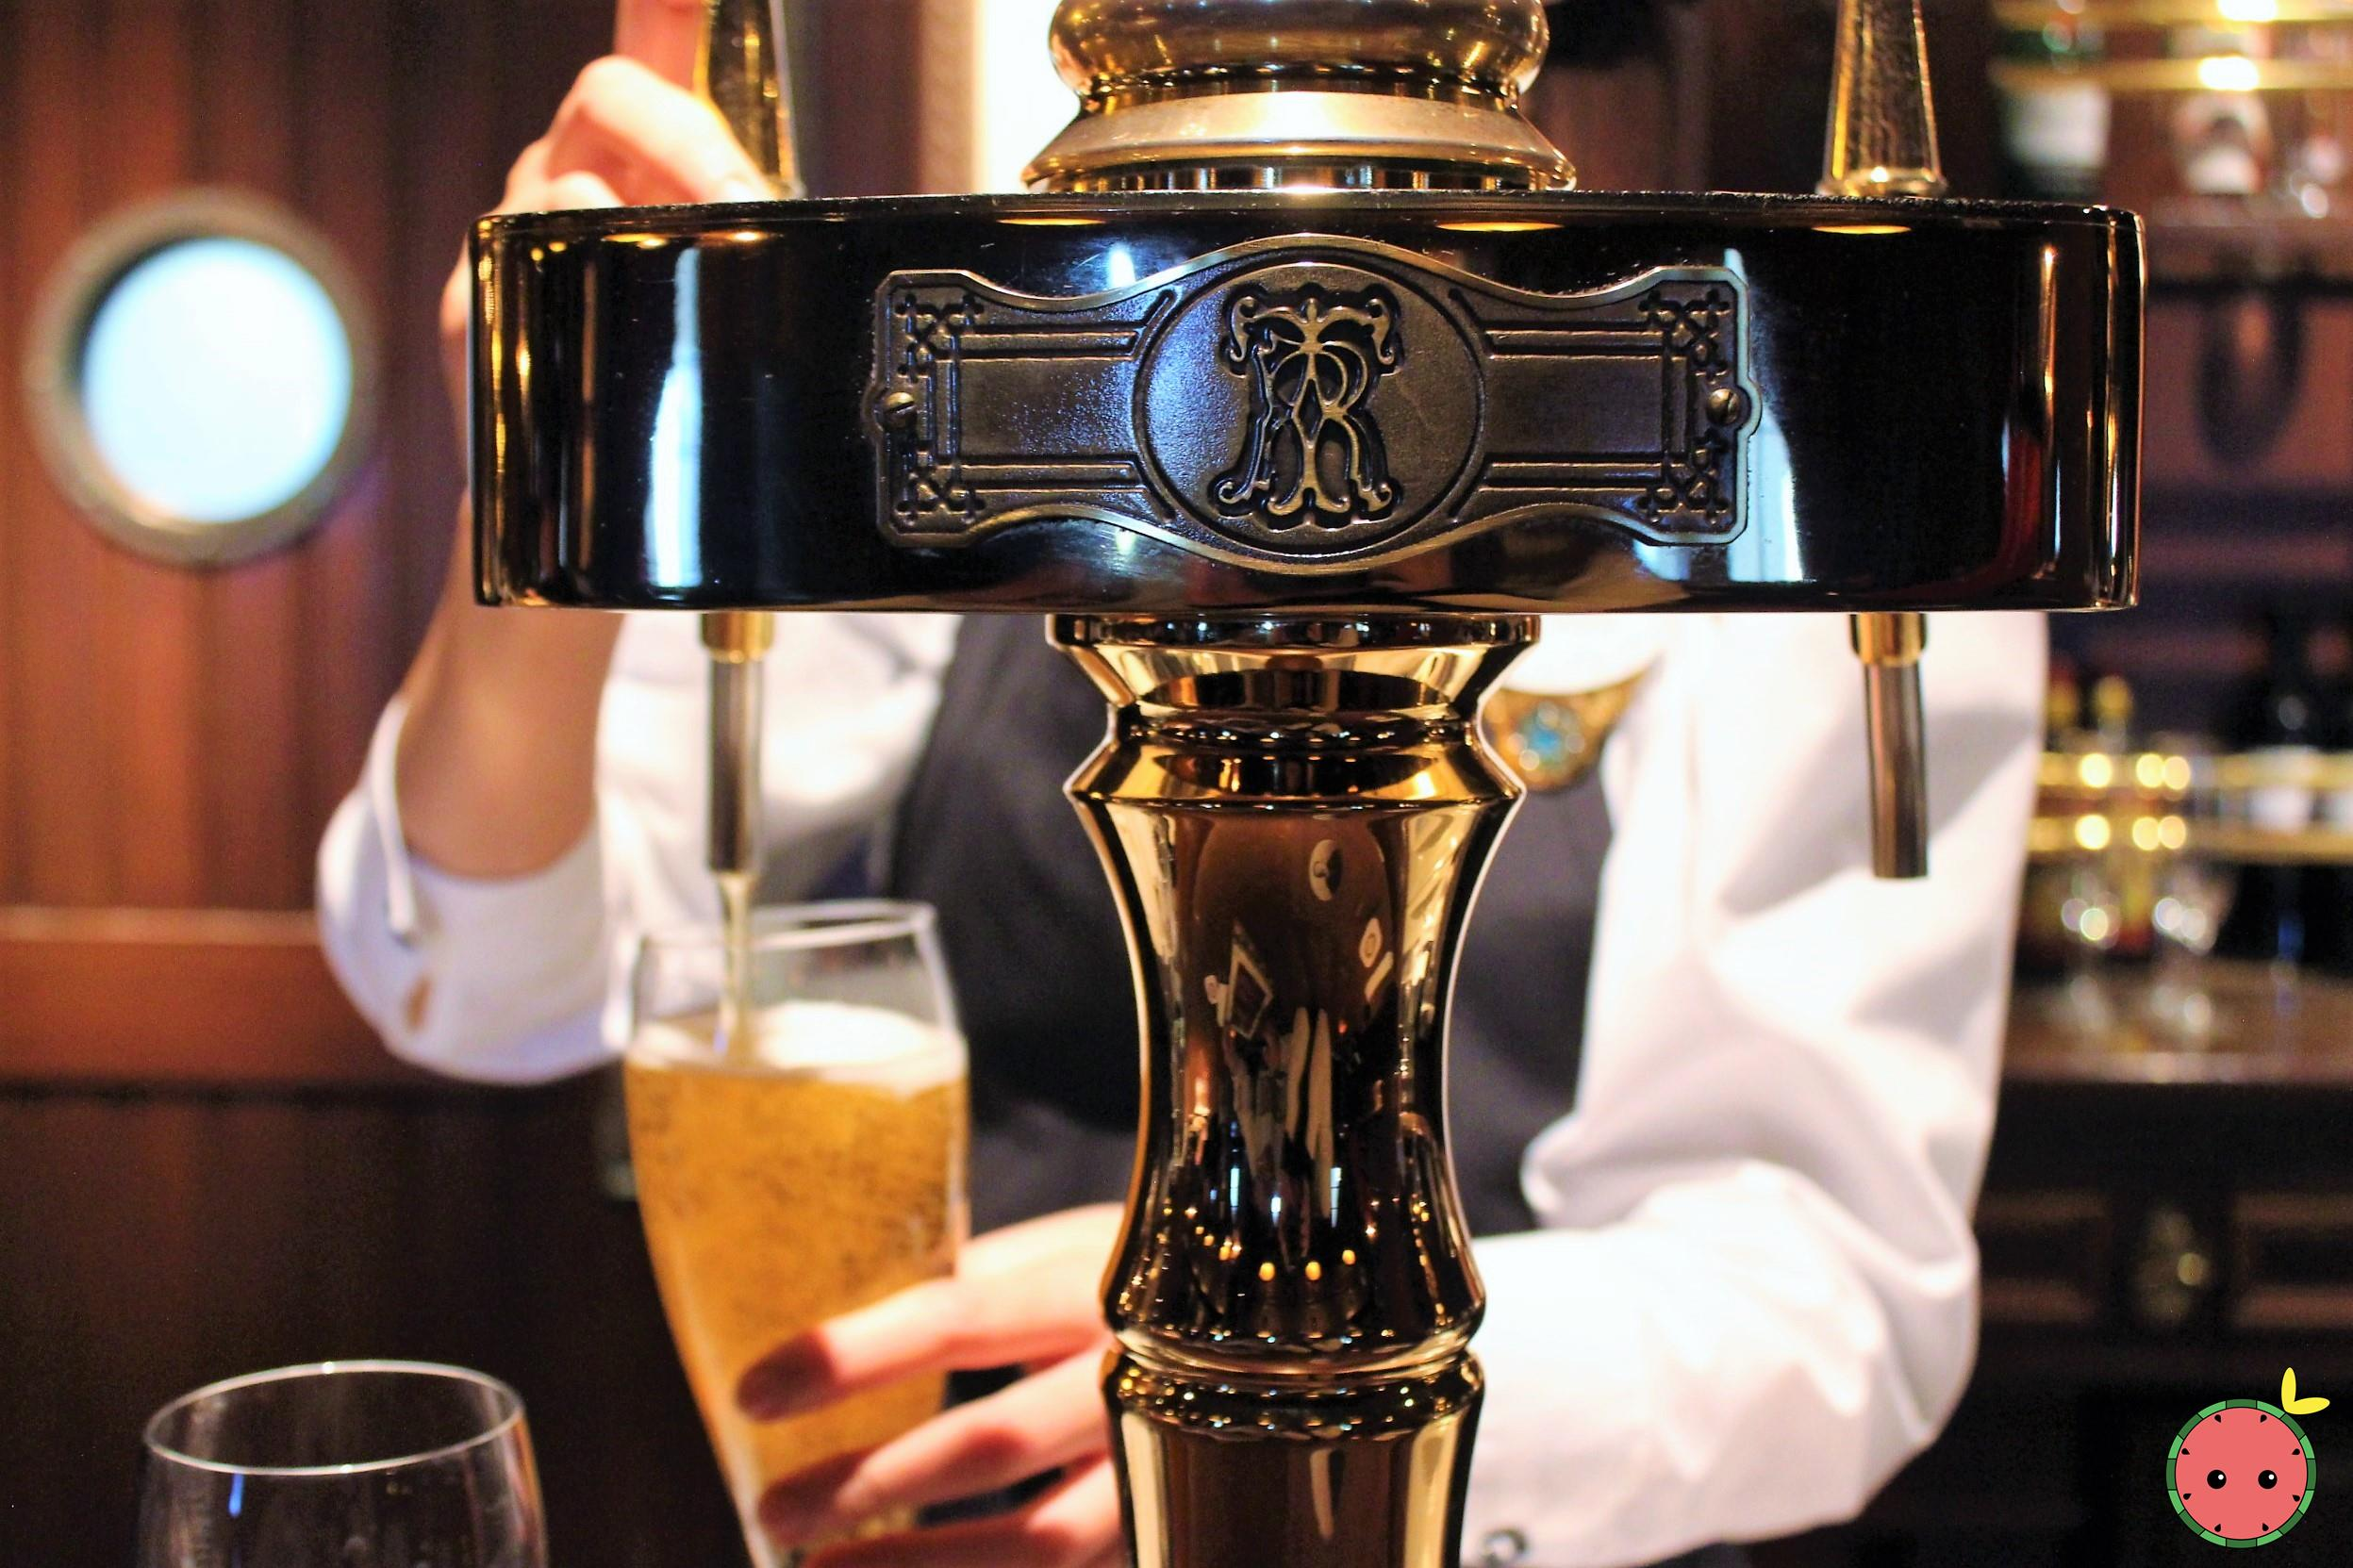 The Teddy Roosevelt Lounge Beer Dispenser 3